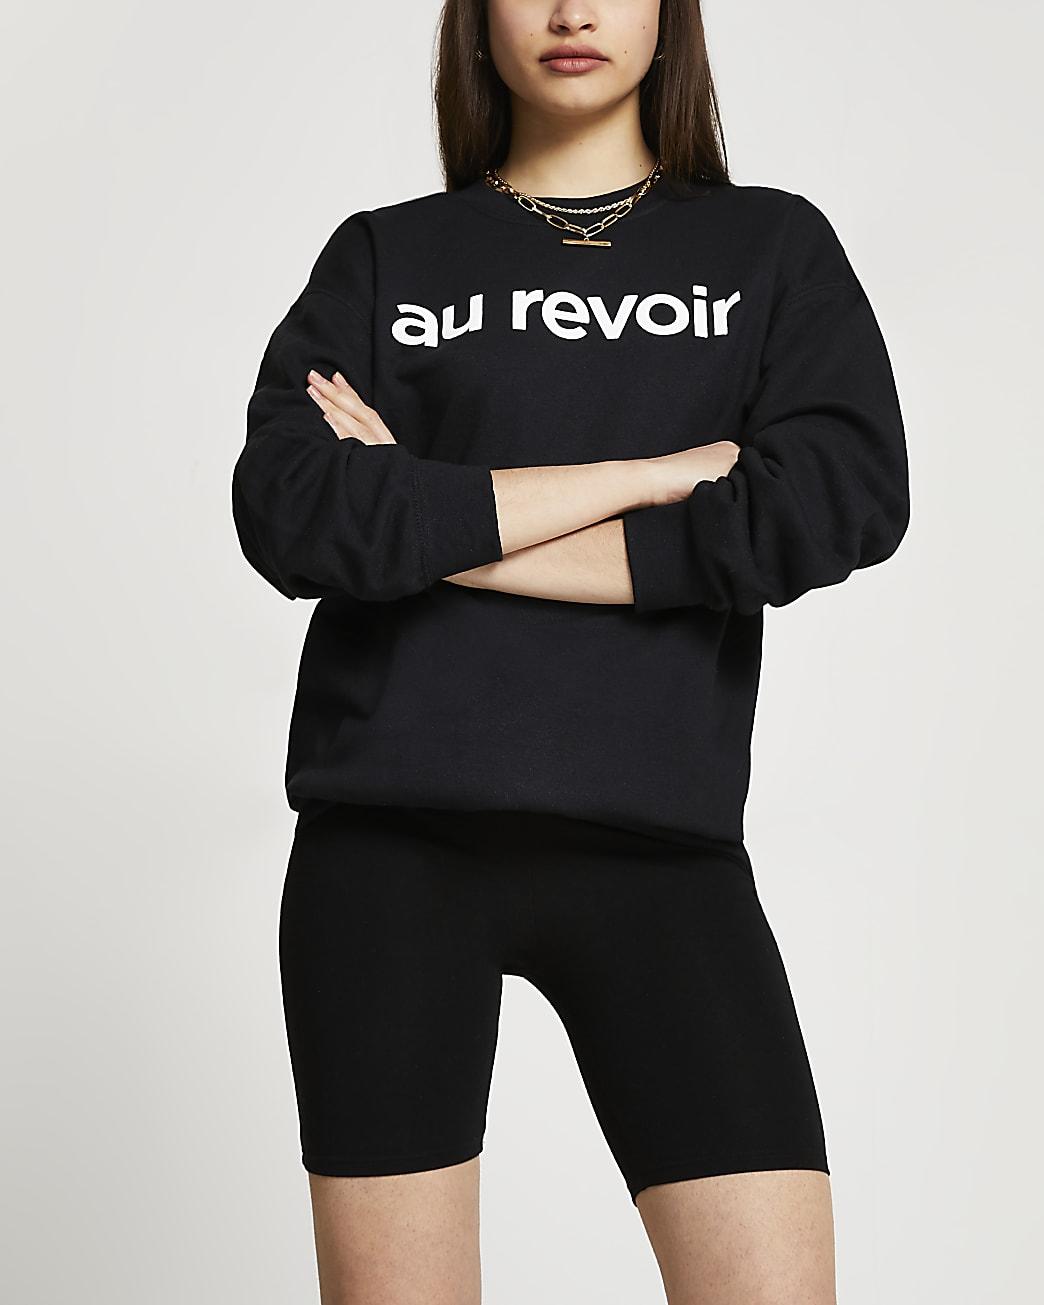 Black 'Au Revoir' sweatshirt